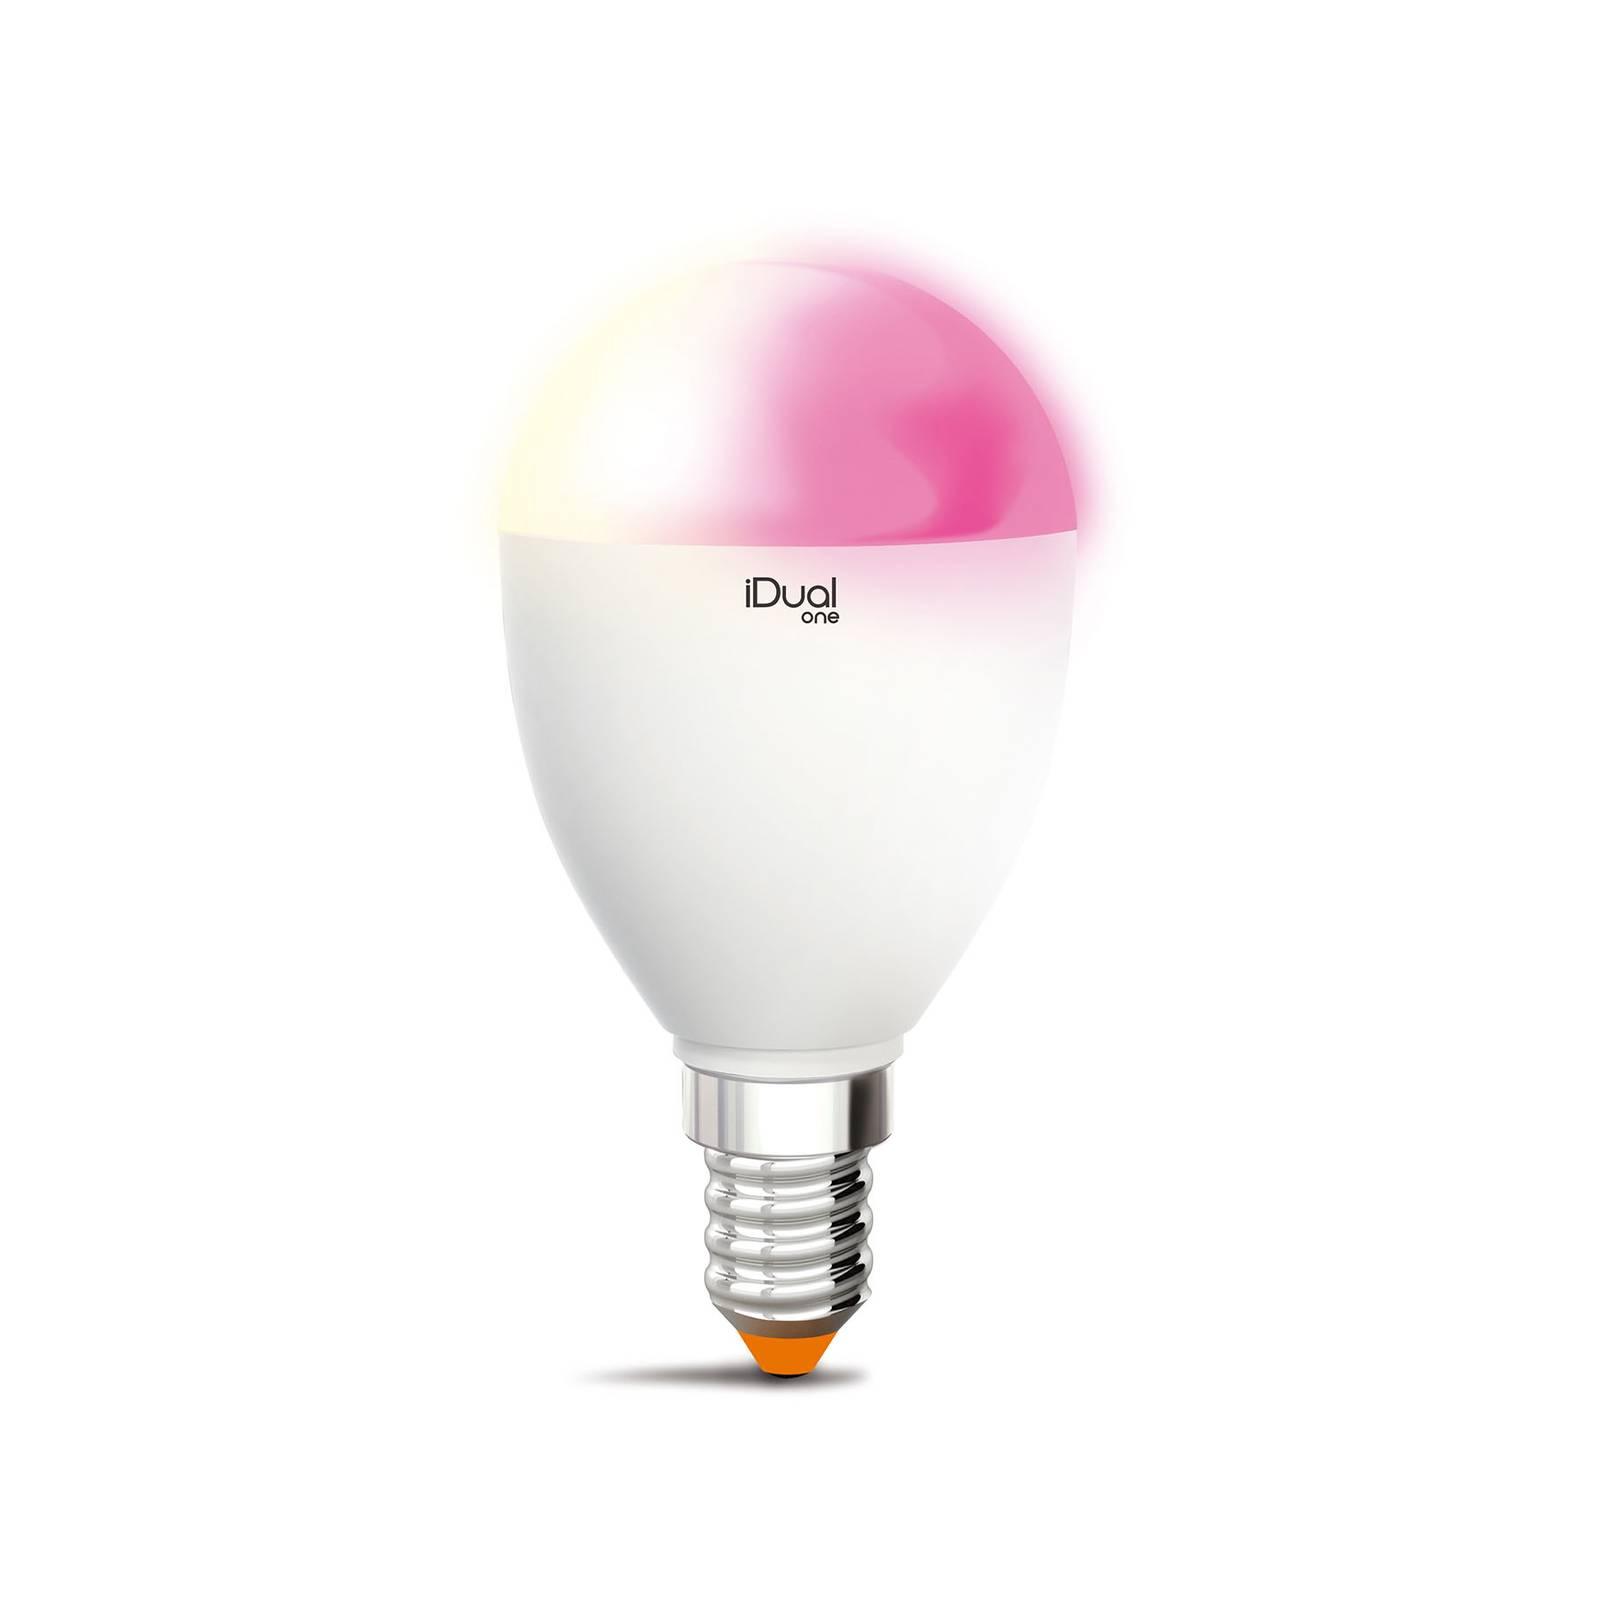 iDual One -LED-kynttilälamppu E14 5,3W 400 lm RGBW